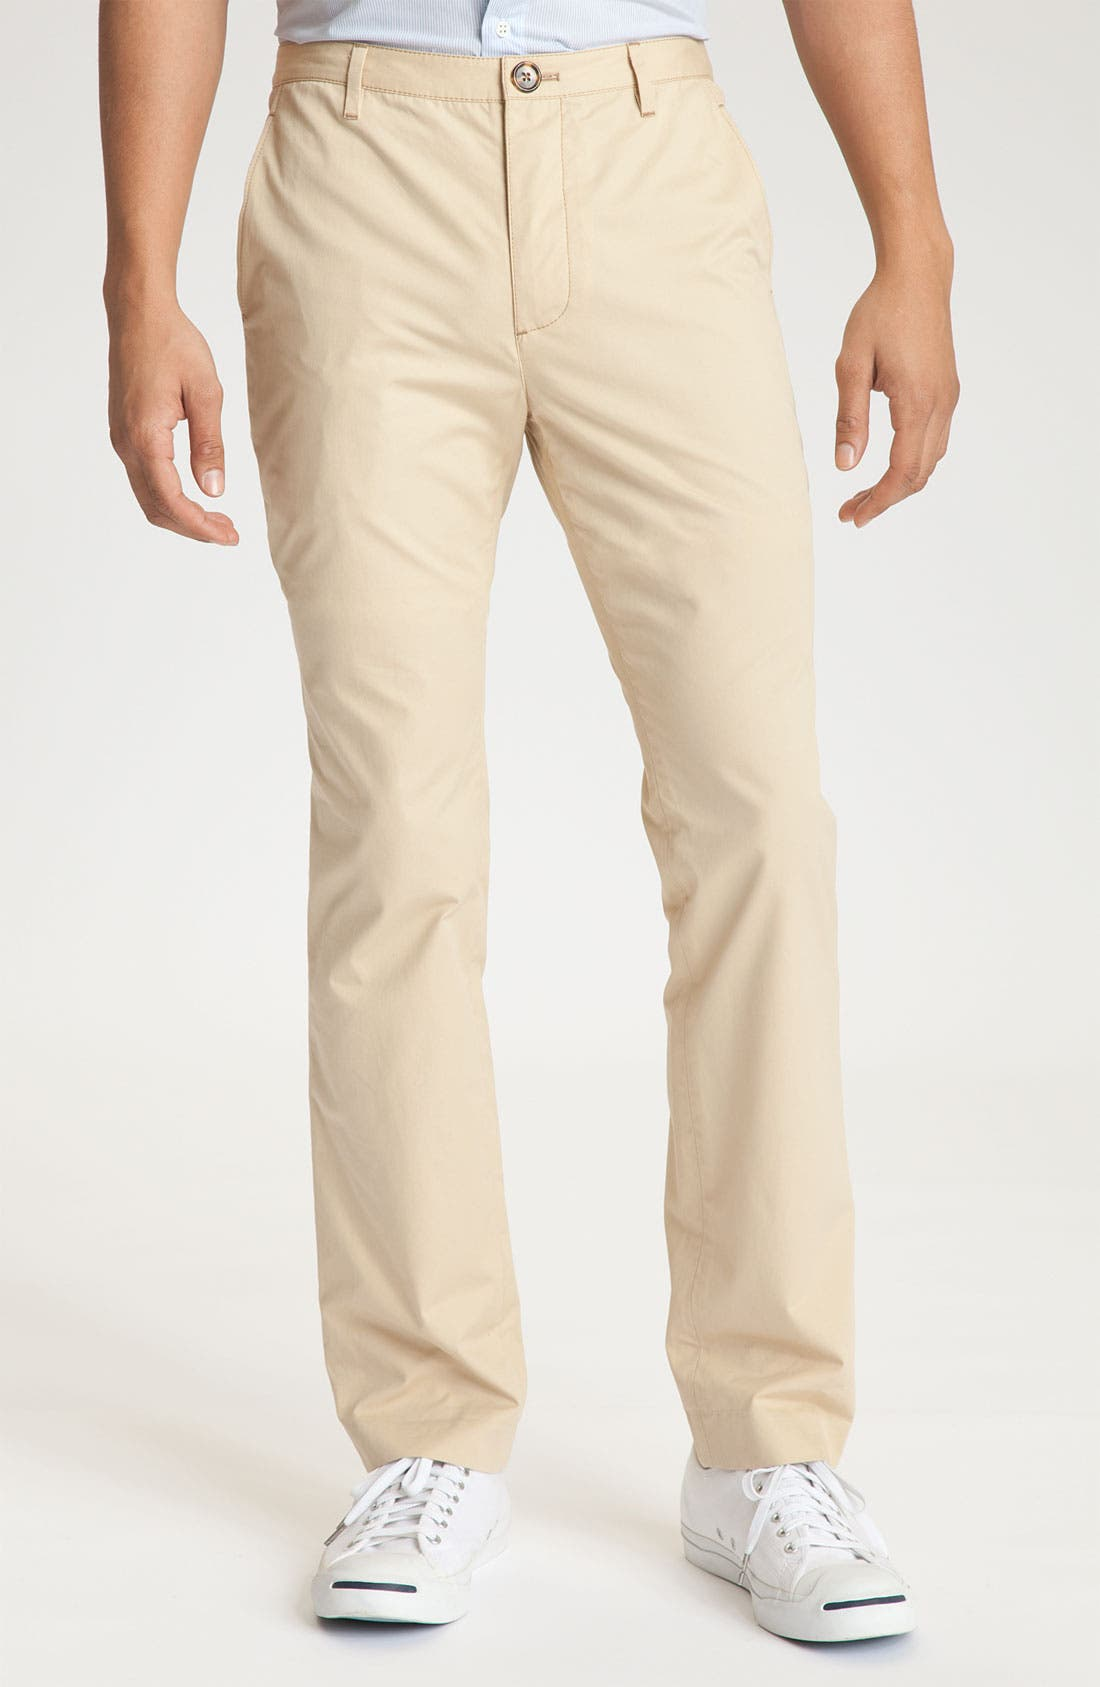 Main Image - Shipley & Halmos 'Belmont' Slim Pants